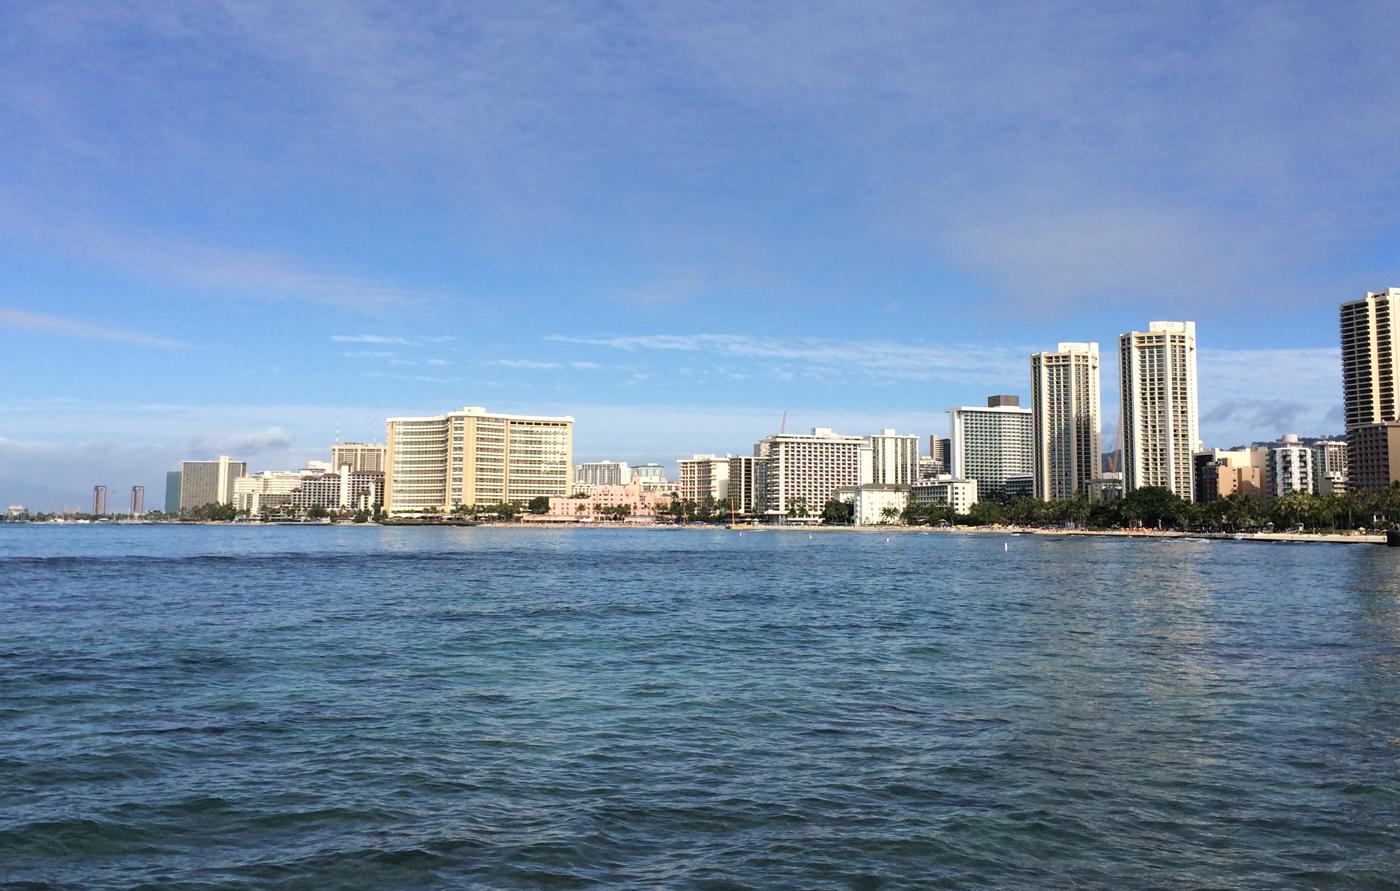 Best Resorts Of Hawaiis Main Island Oahu Revealed WORLD PROPERTY JOURNAL Global News Center